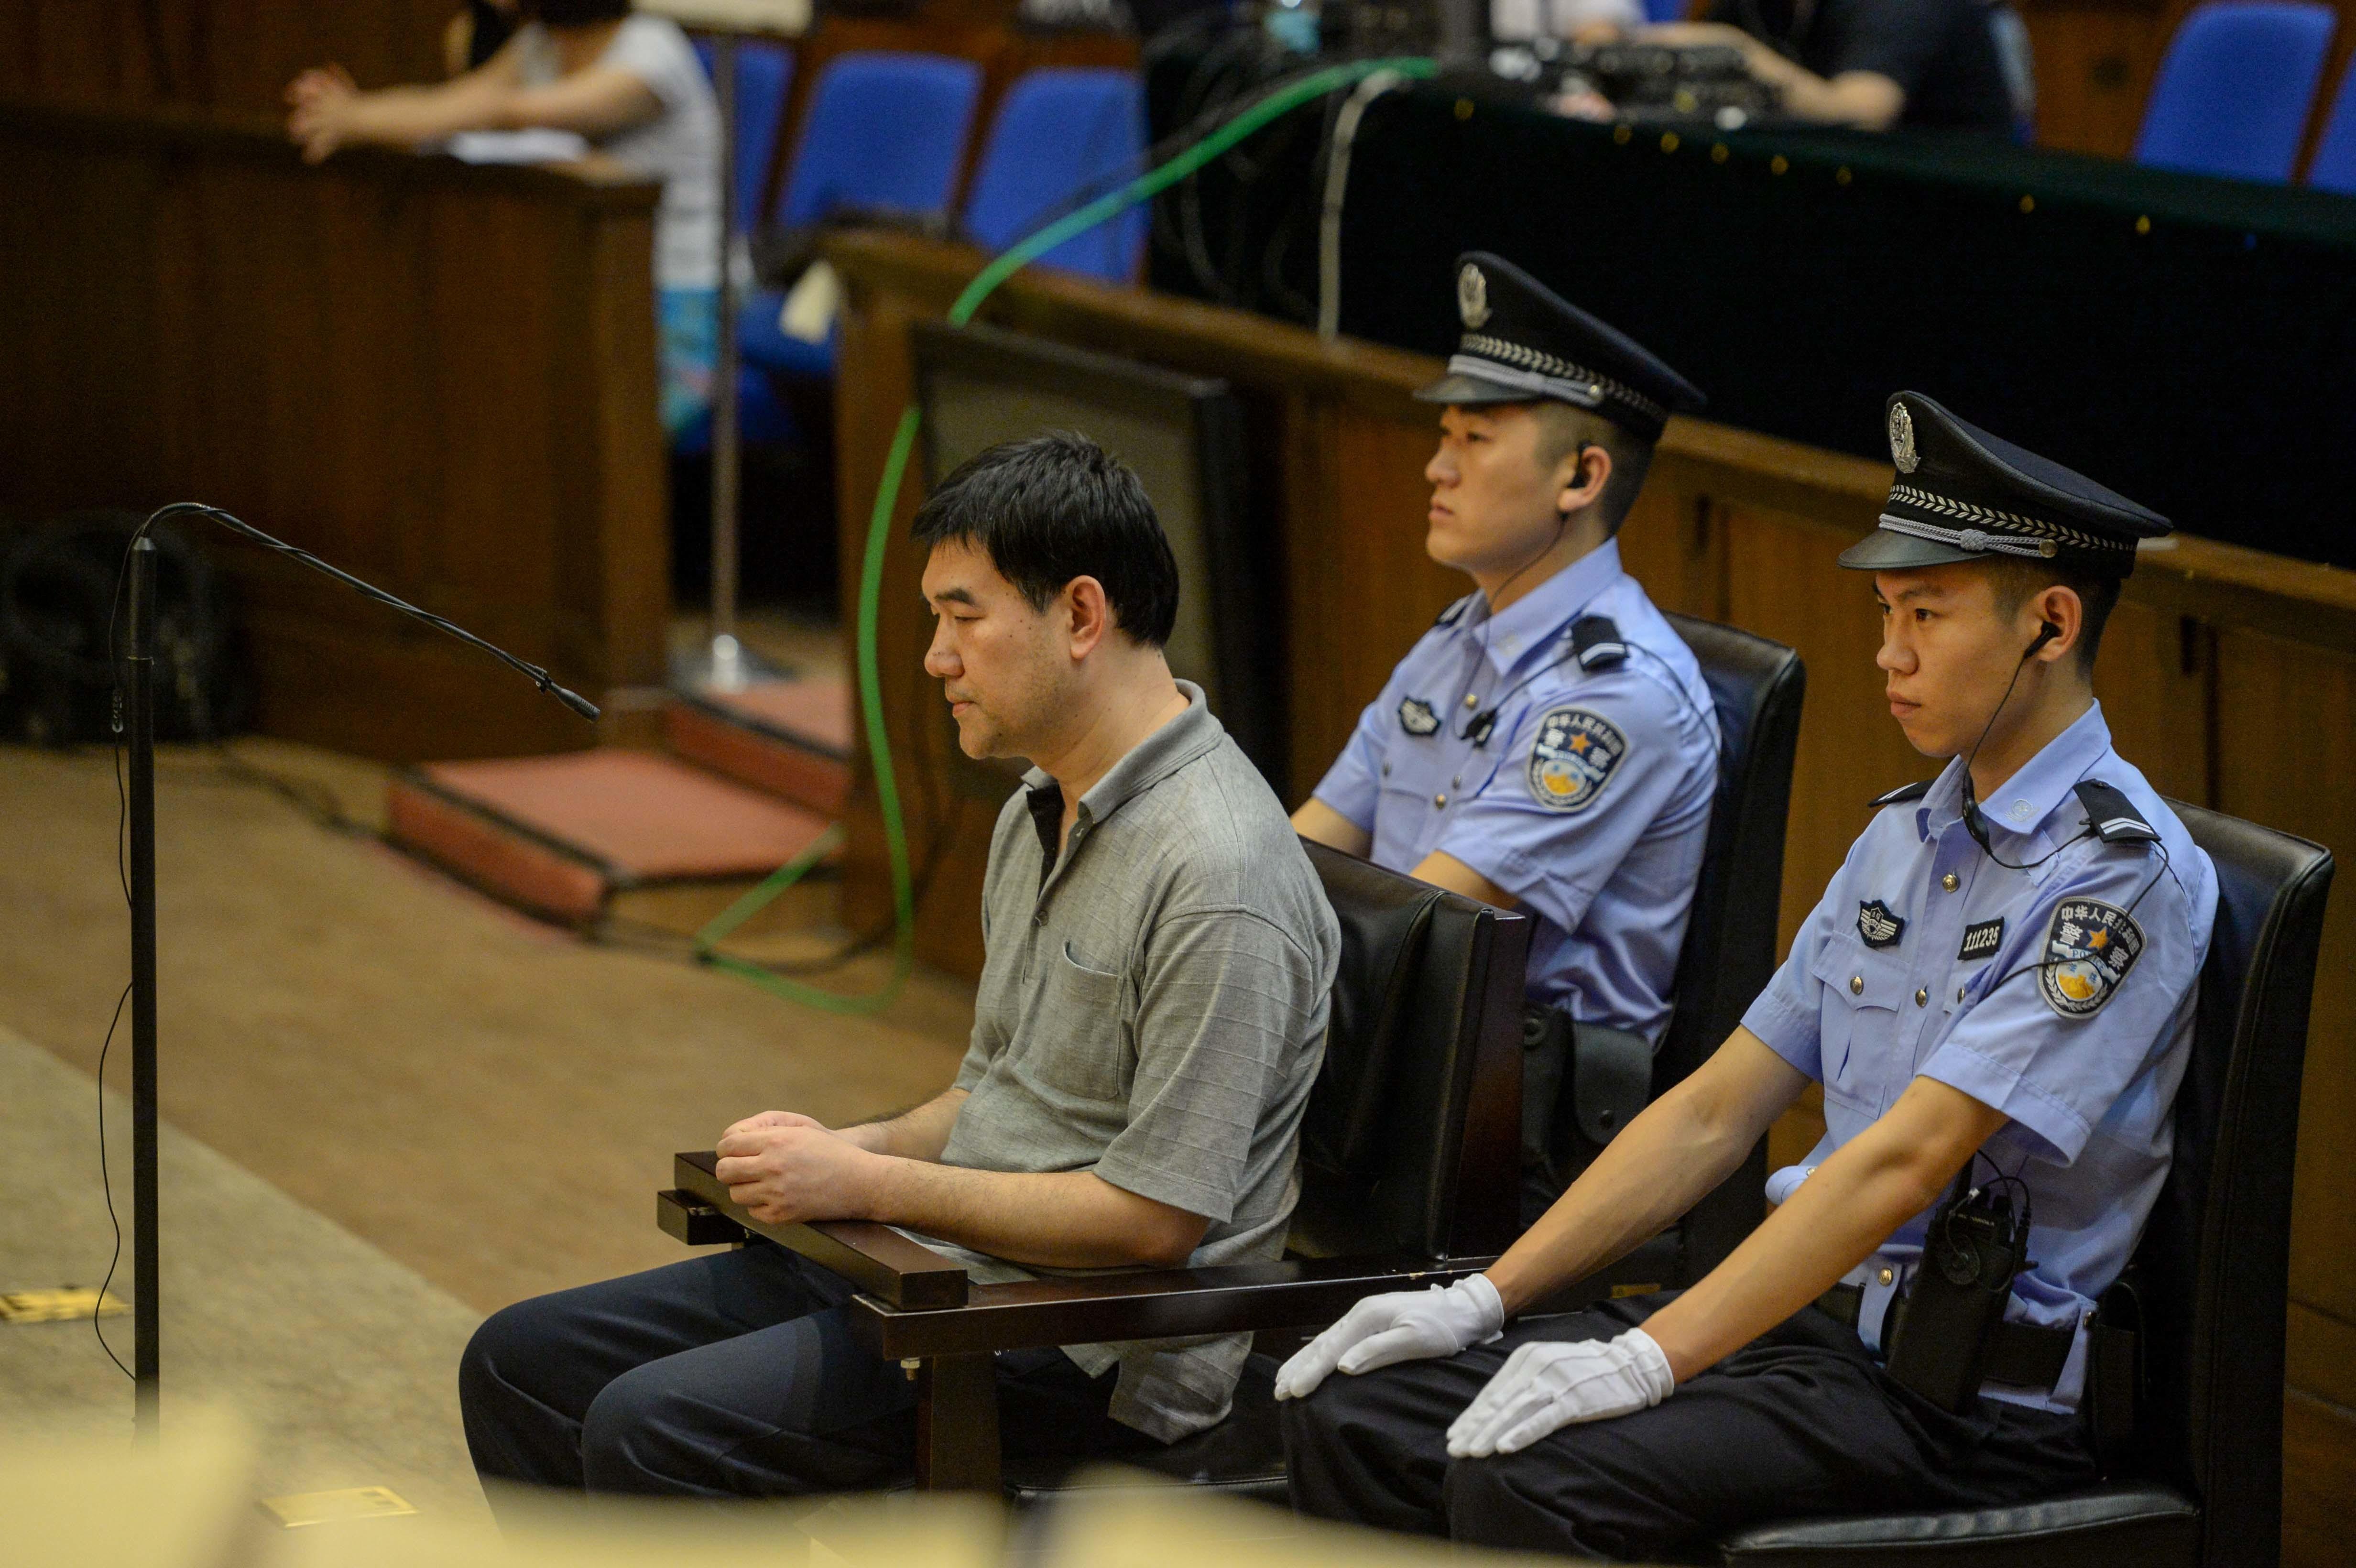 China marks successful repatriation of 4,833 fugitives